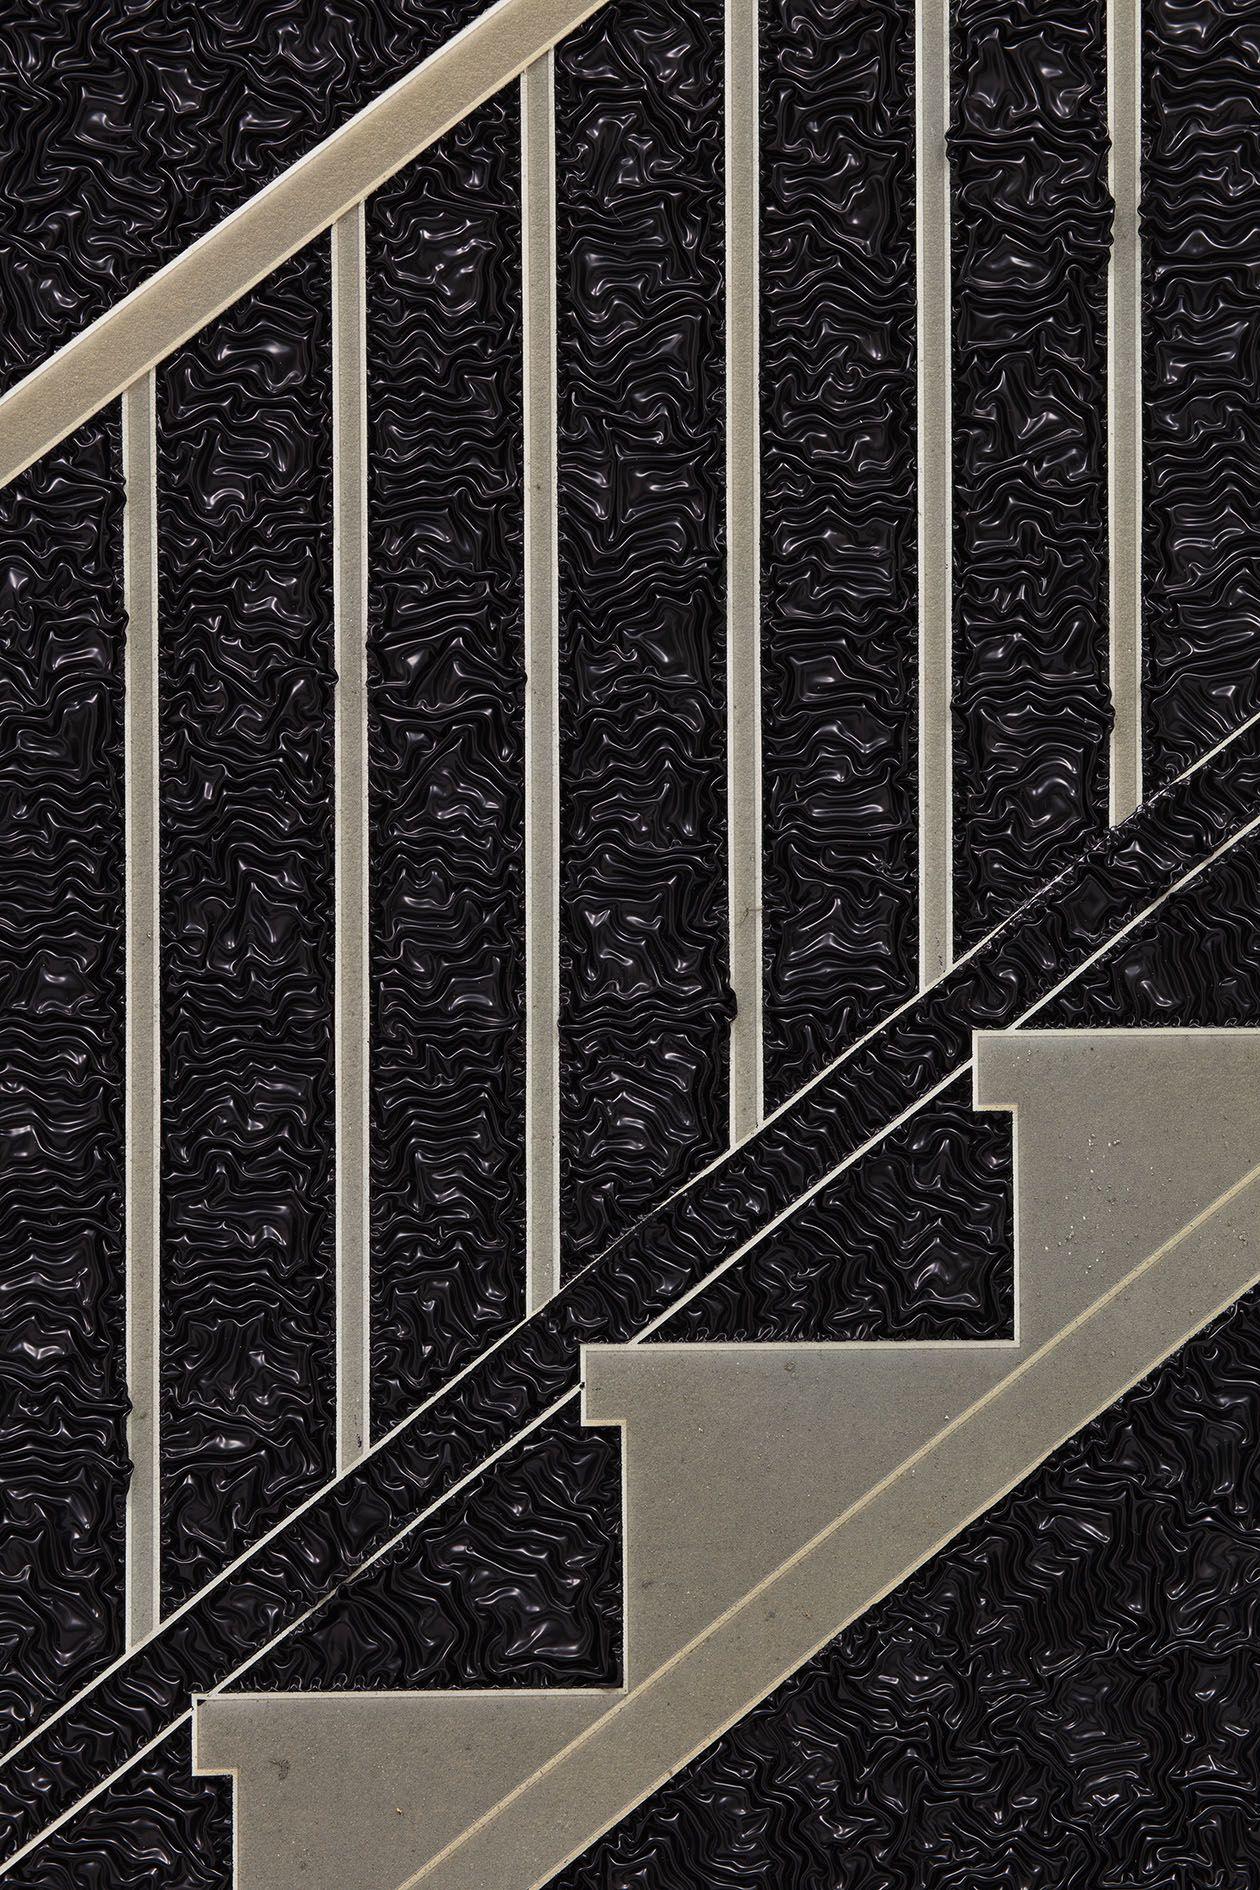 Analia Saban – Folds and Faults – Los Angeles